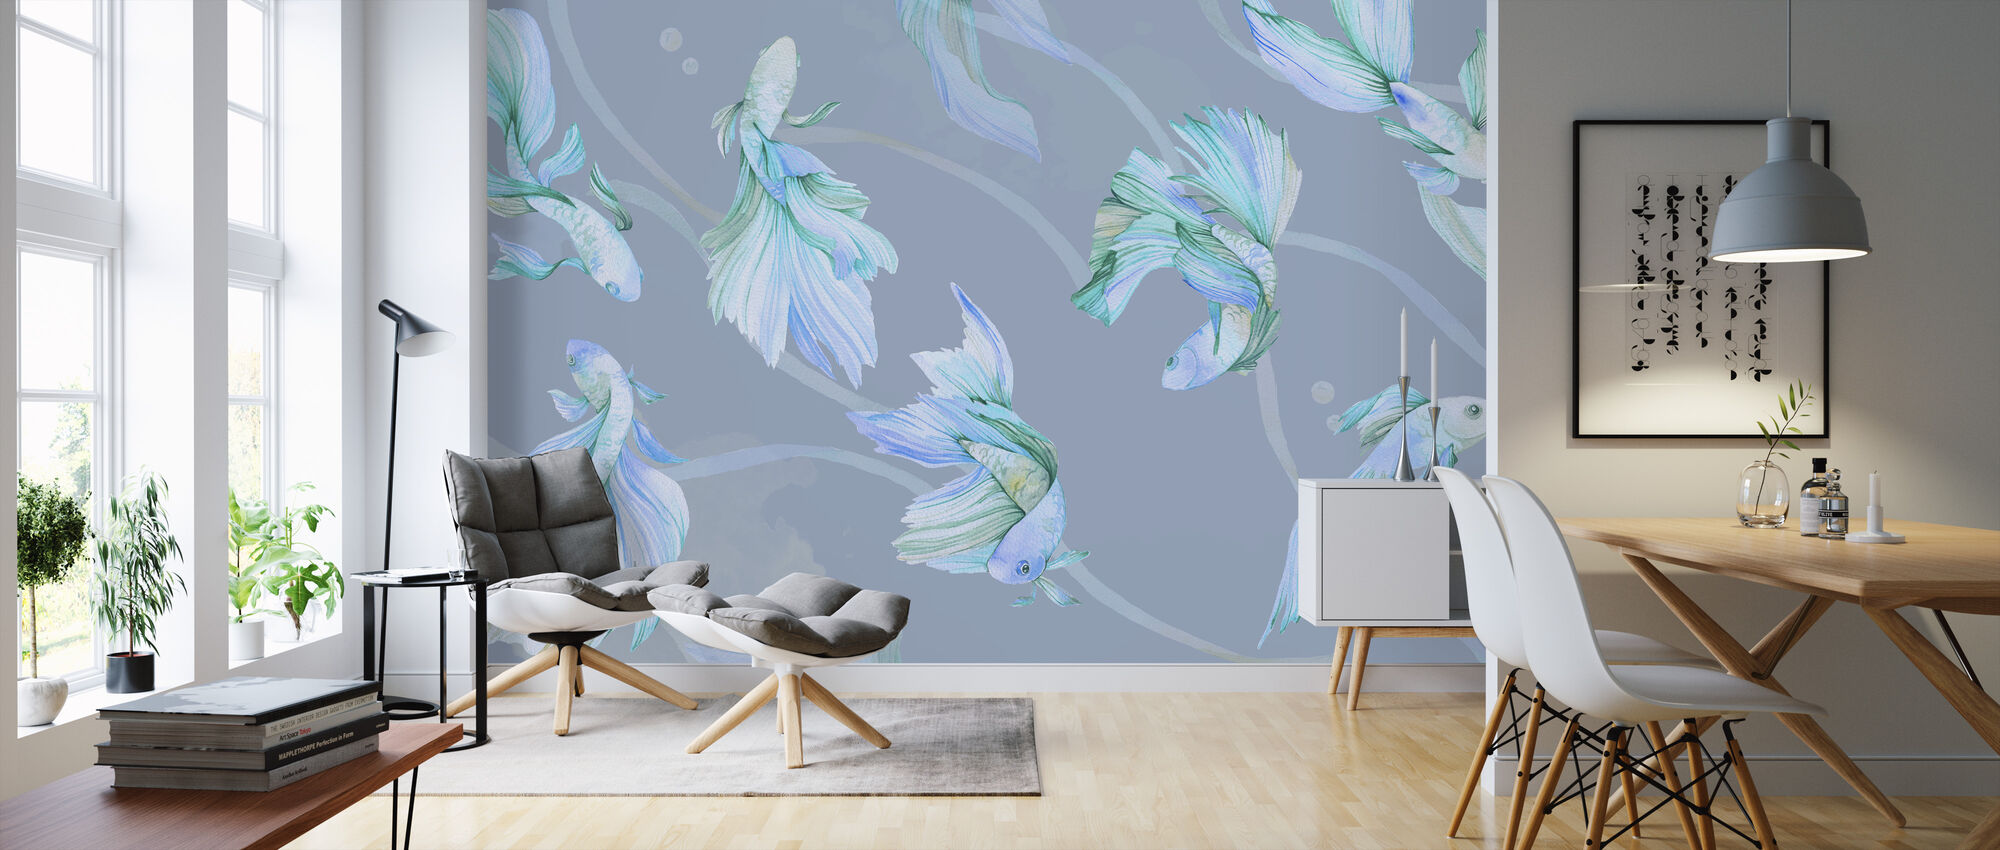 Kei Waltz - Blue - Wallpaper - Living Room